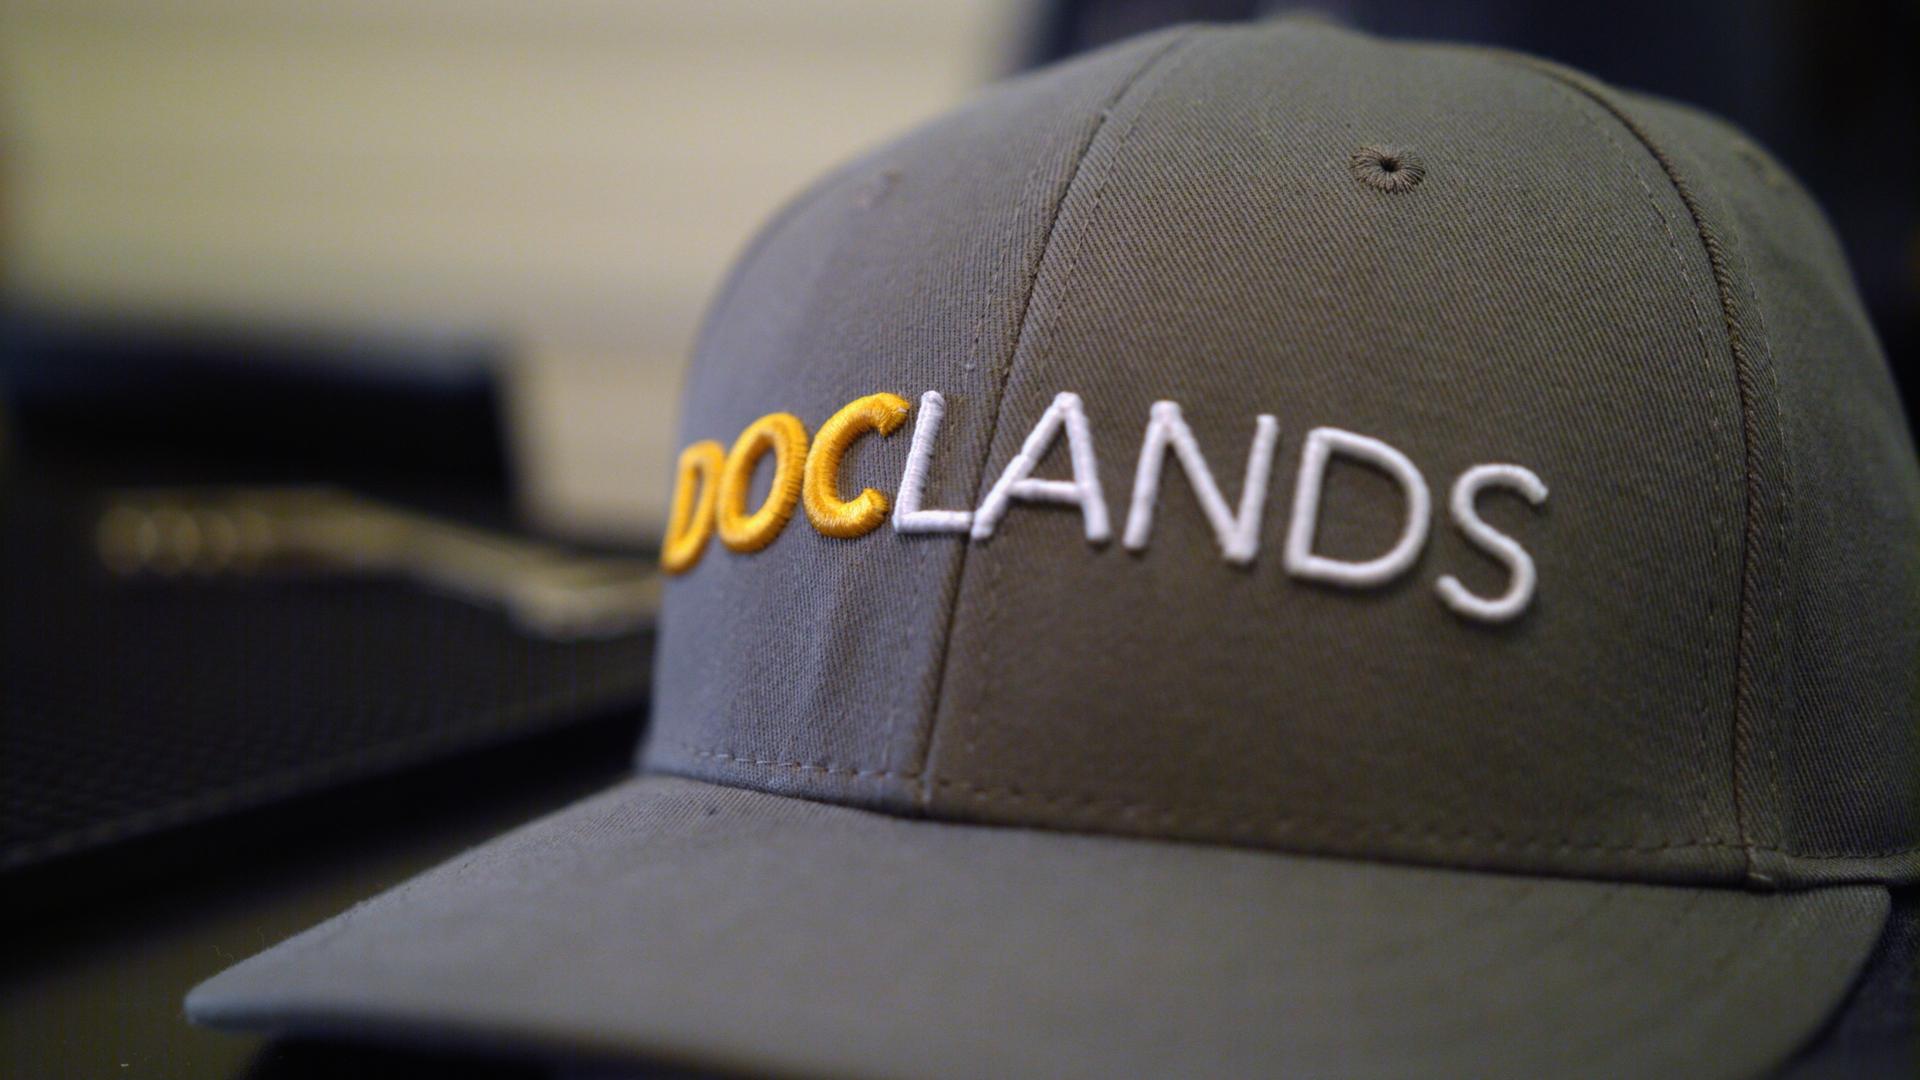 DOCLANDS_Dailies04_1.85.1.jpg